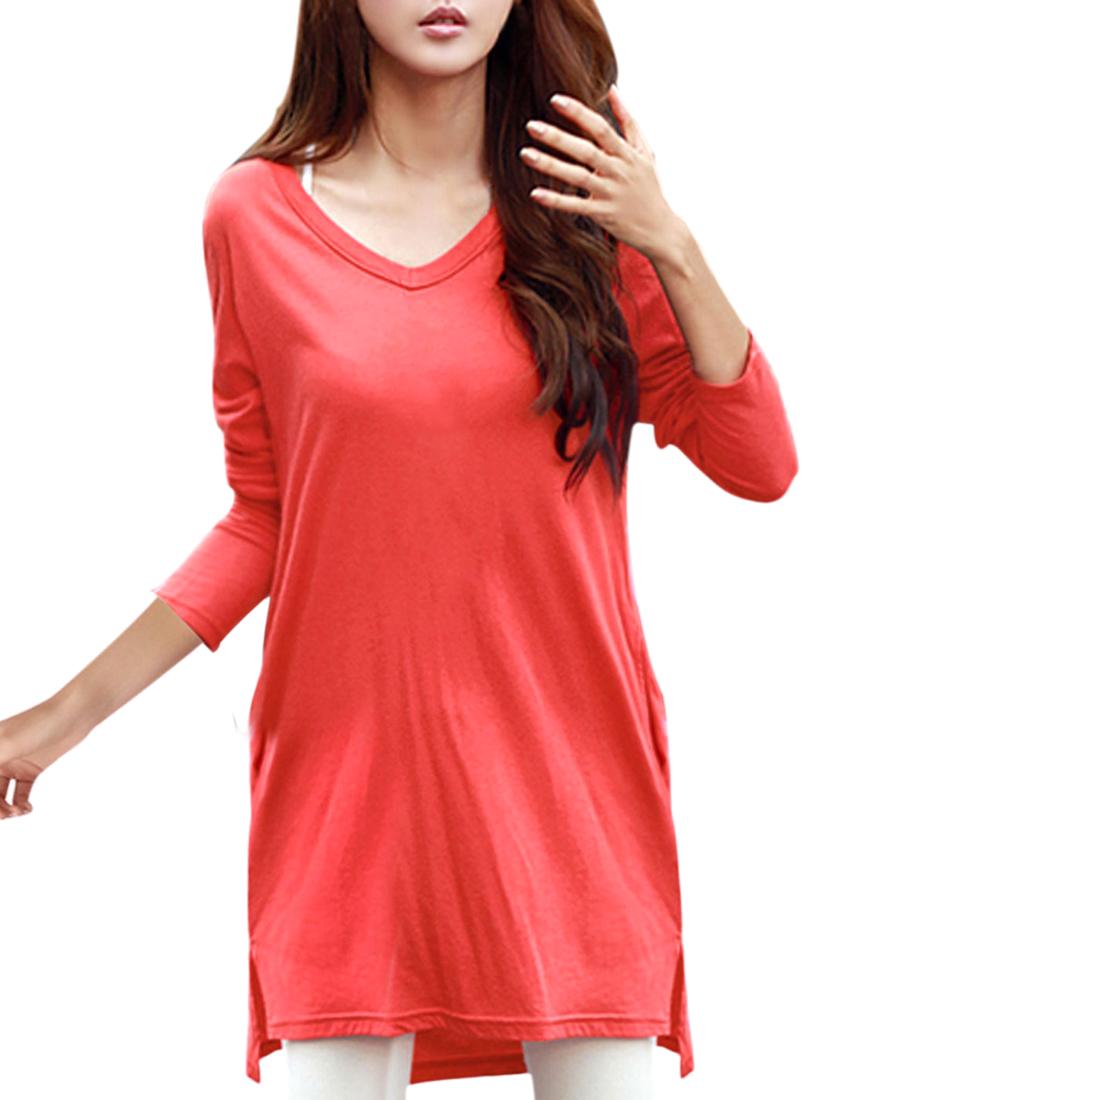 Allegra K Woman Side-Slit Two Pockets V-Neckline Longline Top Red XS